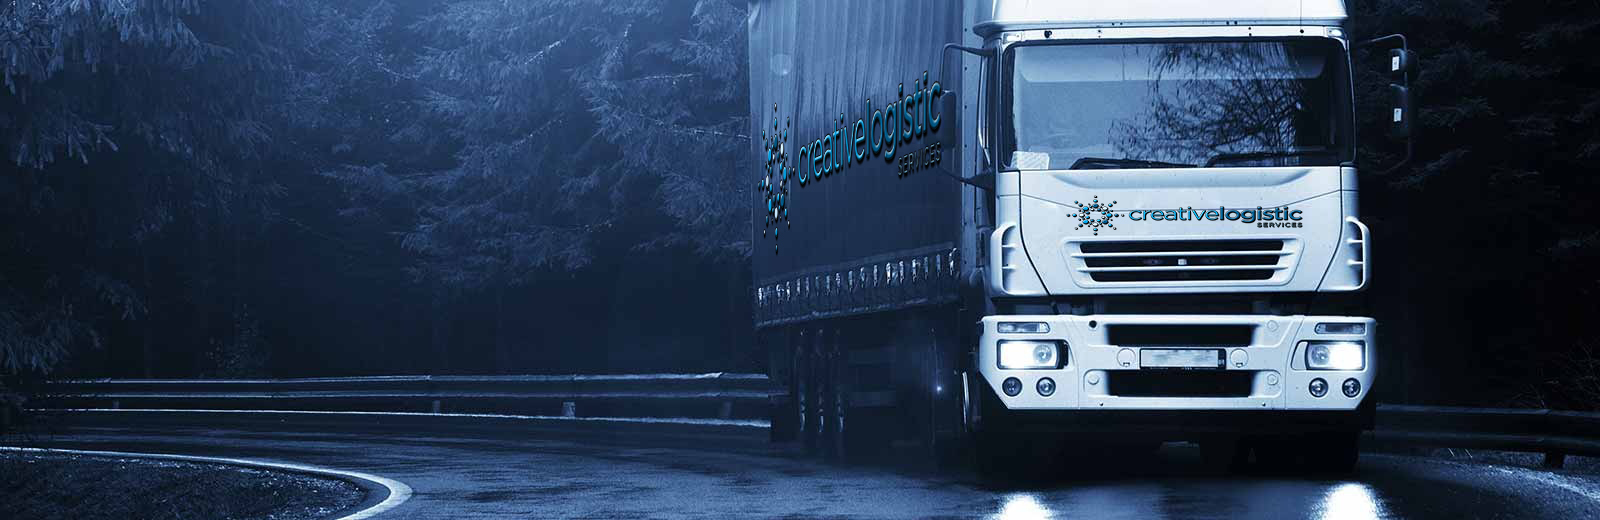 truck CLS Get Quote - Copy TRUCK (JPG).jpg